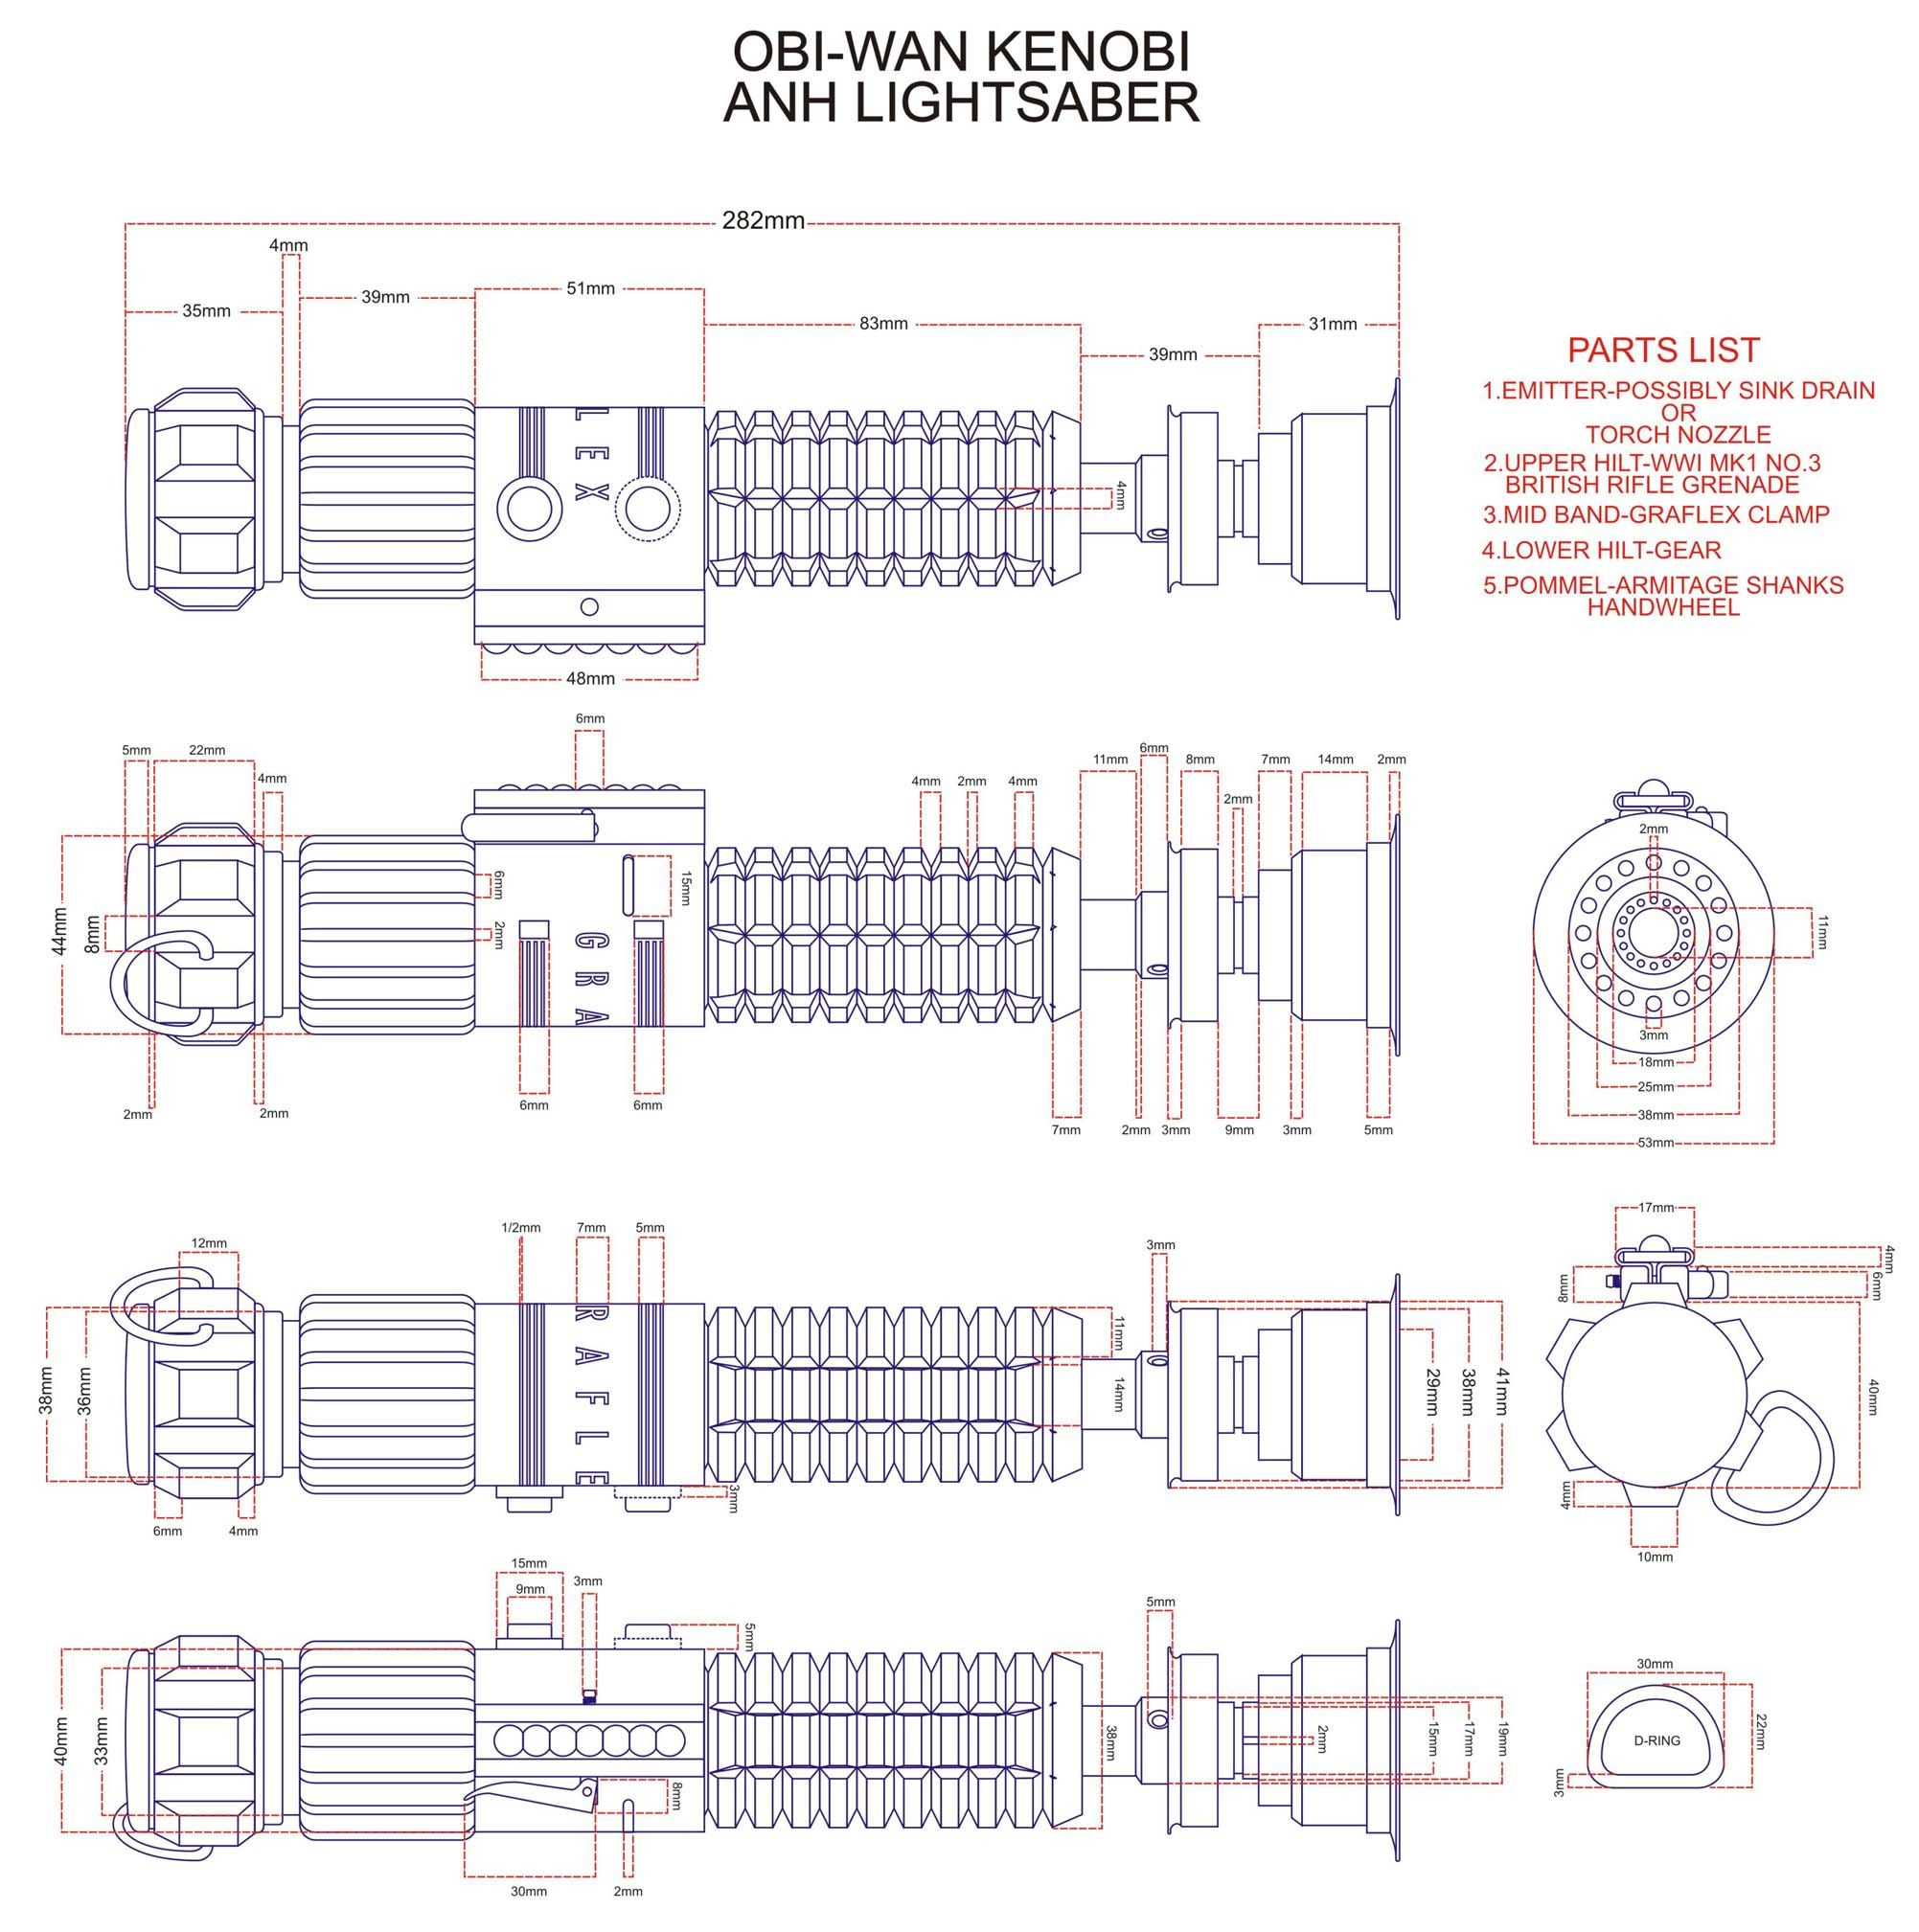 Blueprint drawn by darthsaber star wars pinterest blueprint blueprint drawn by darthsaber malvernweather Gallery